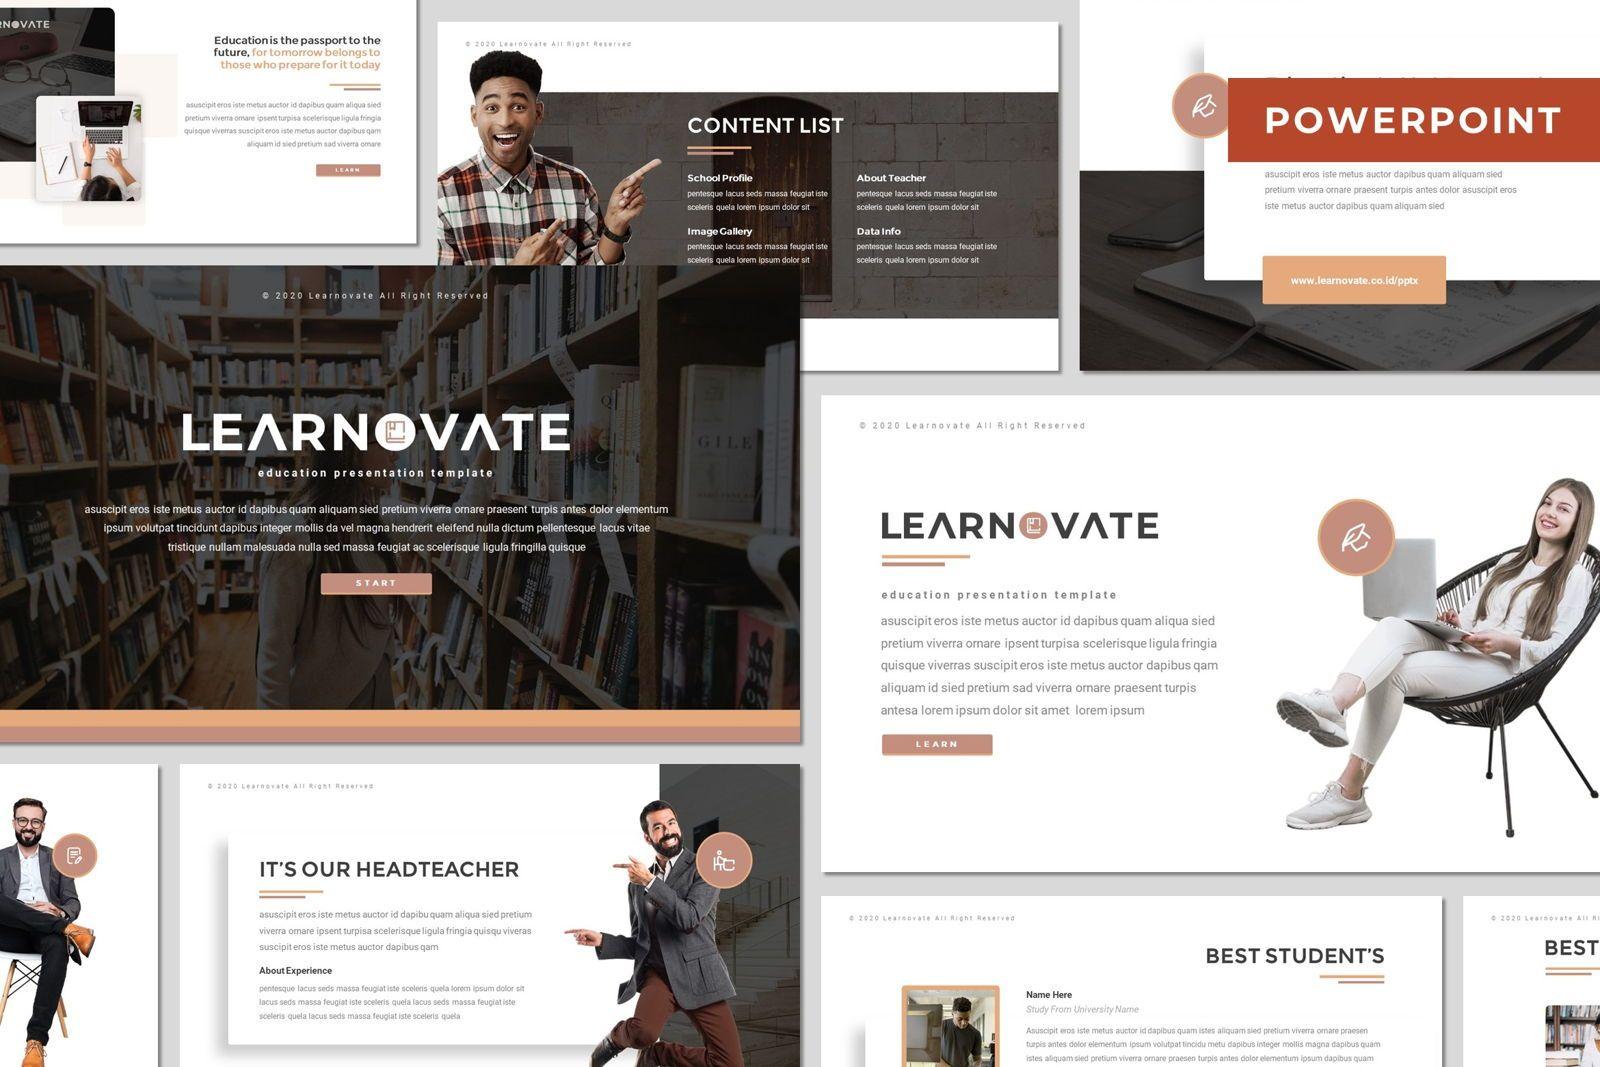 Learnovate - Powerpoint Template, 08033, Presentation Templates — PoweredTemplate.com